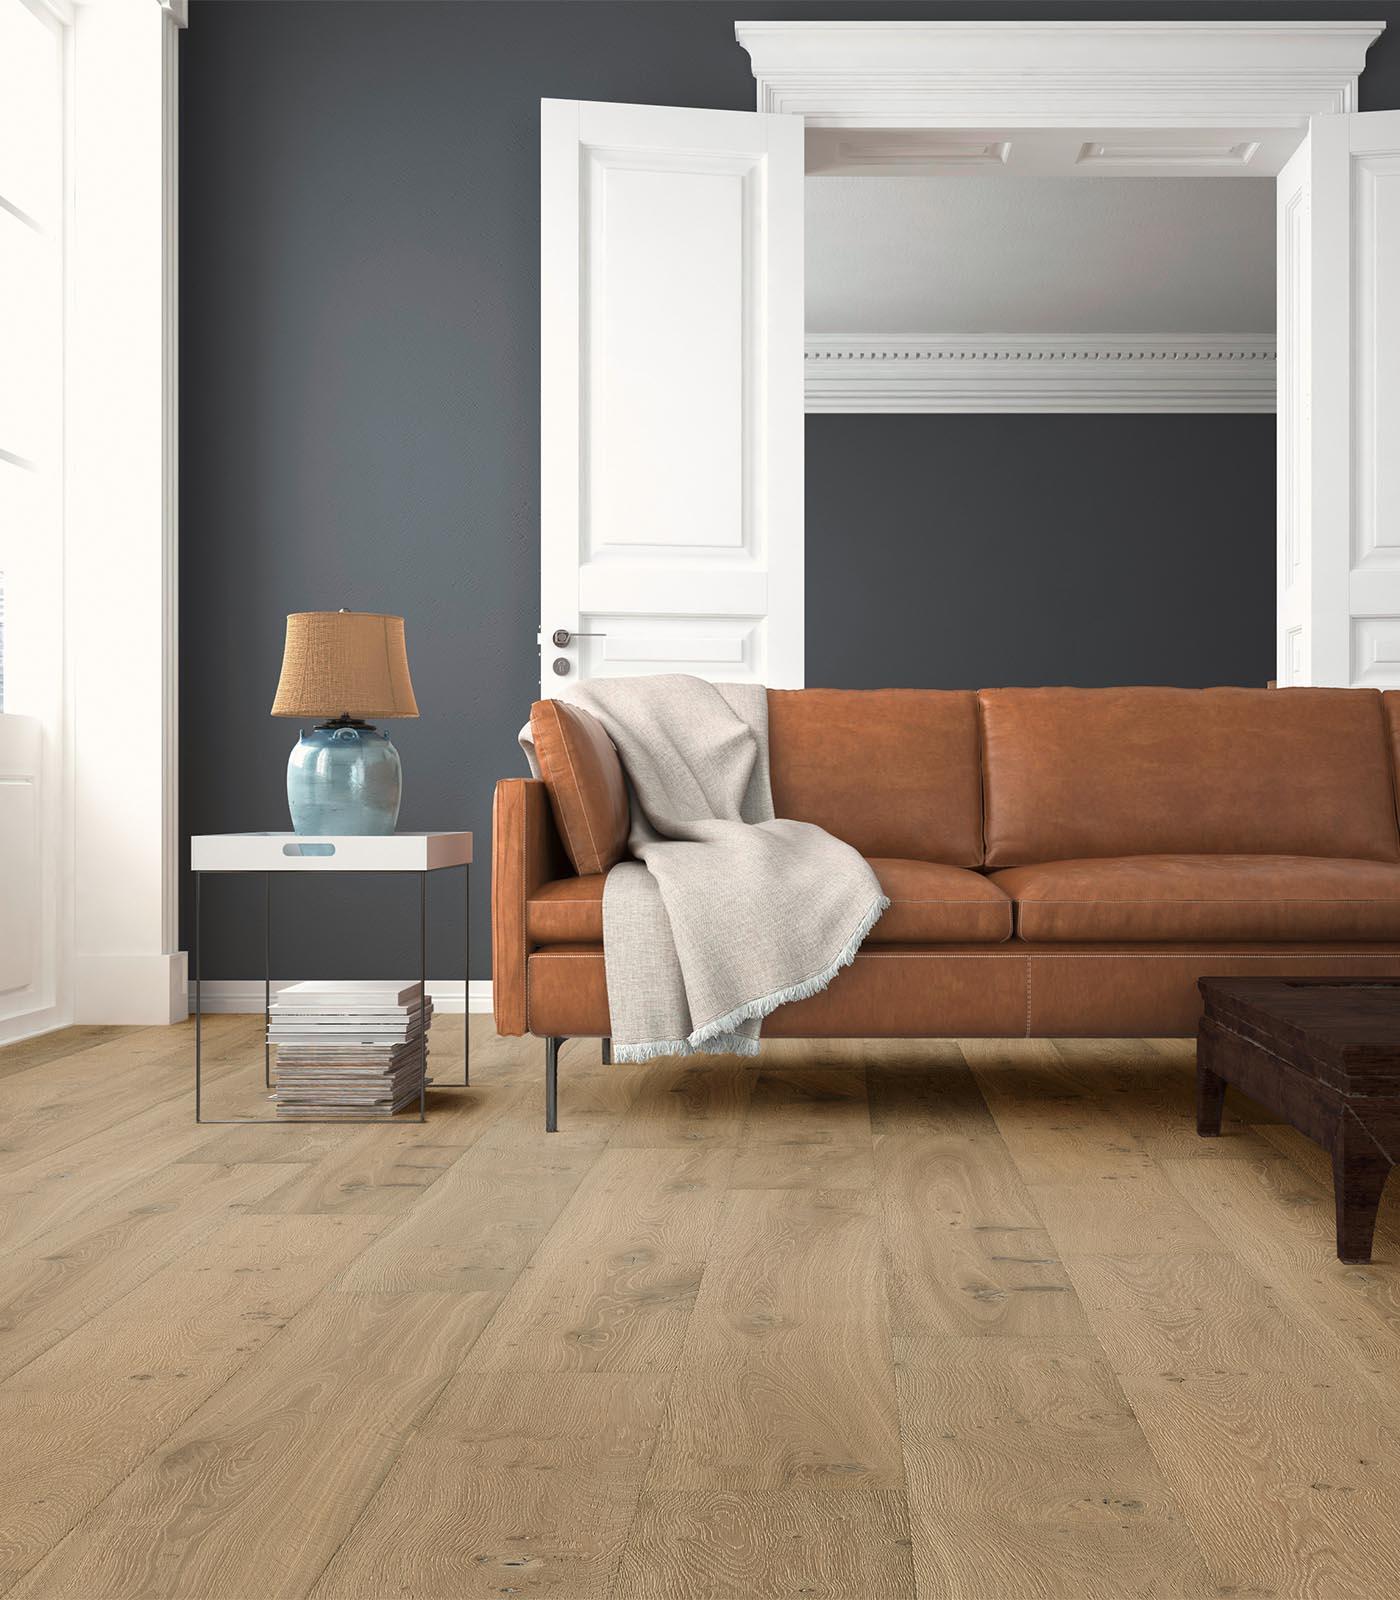 Assisi-European Oak Floors-Heritage Collection-room